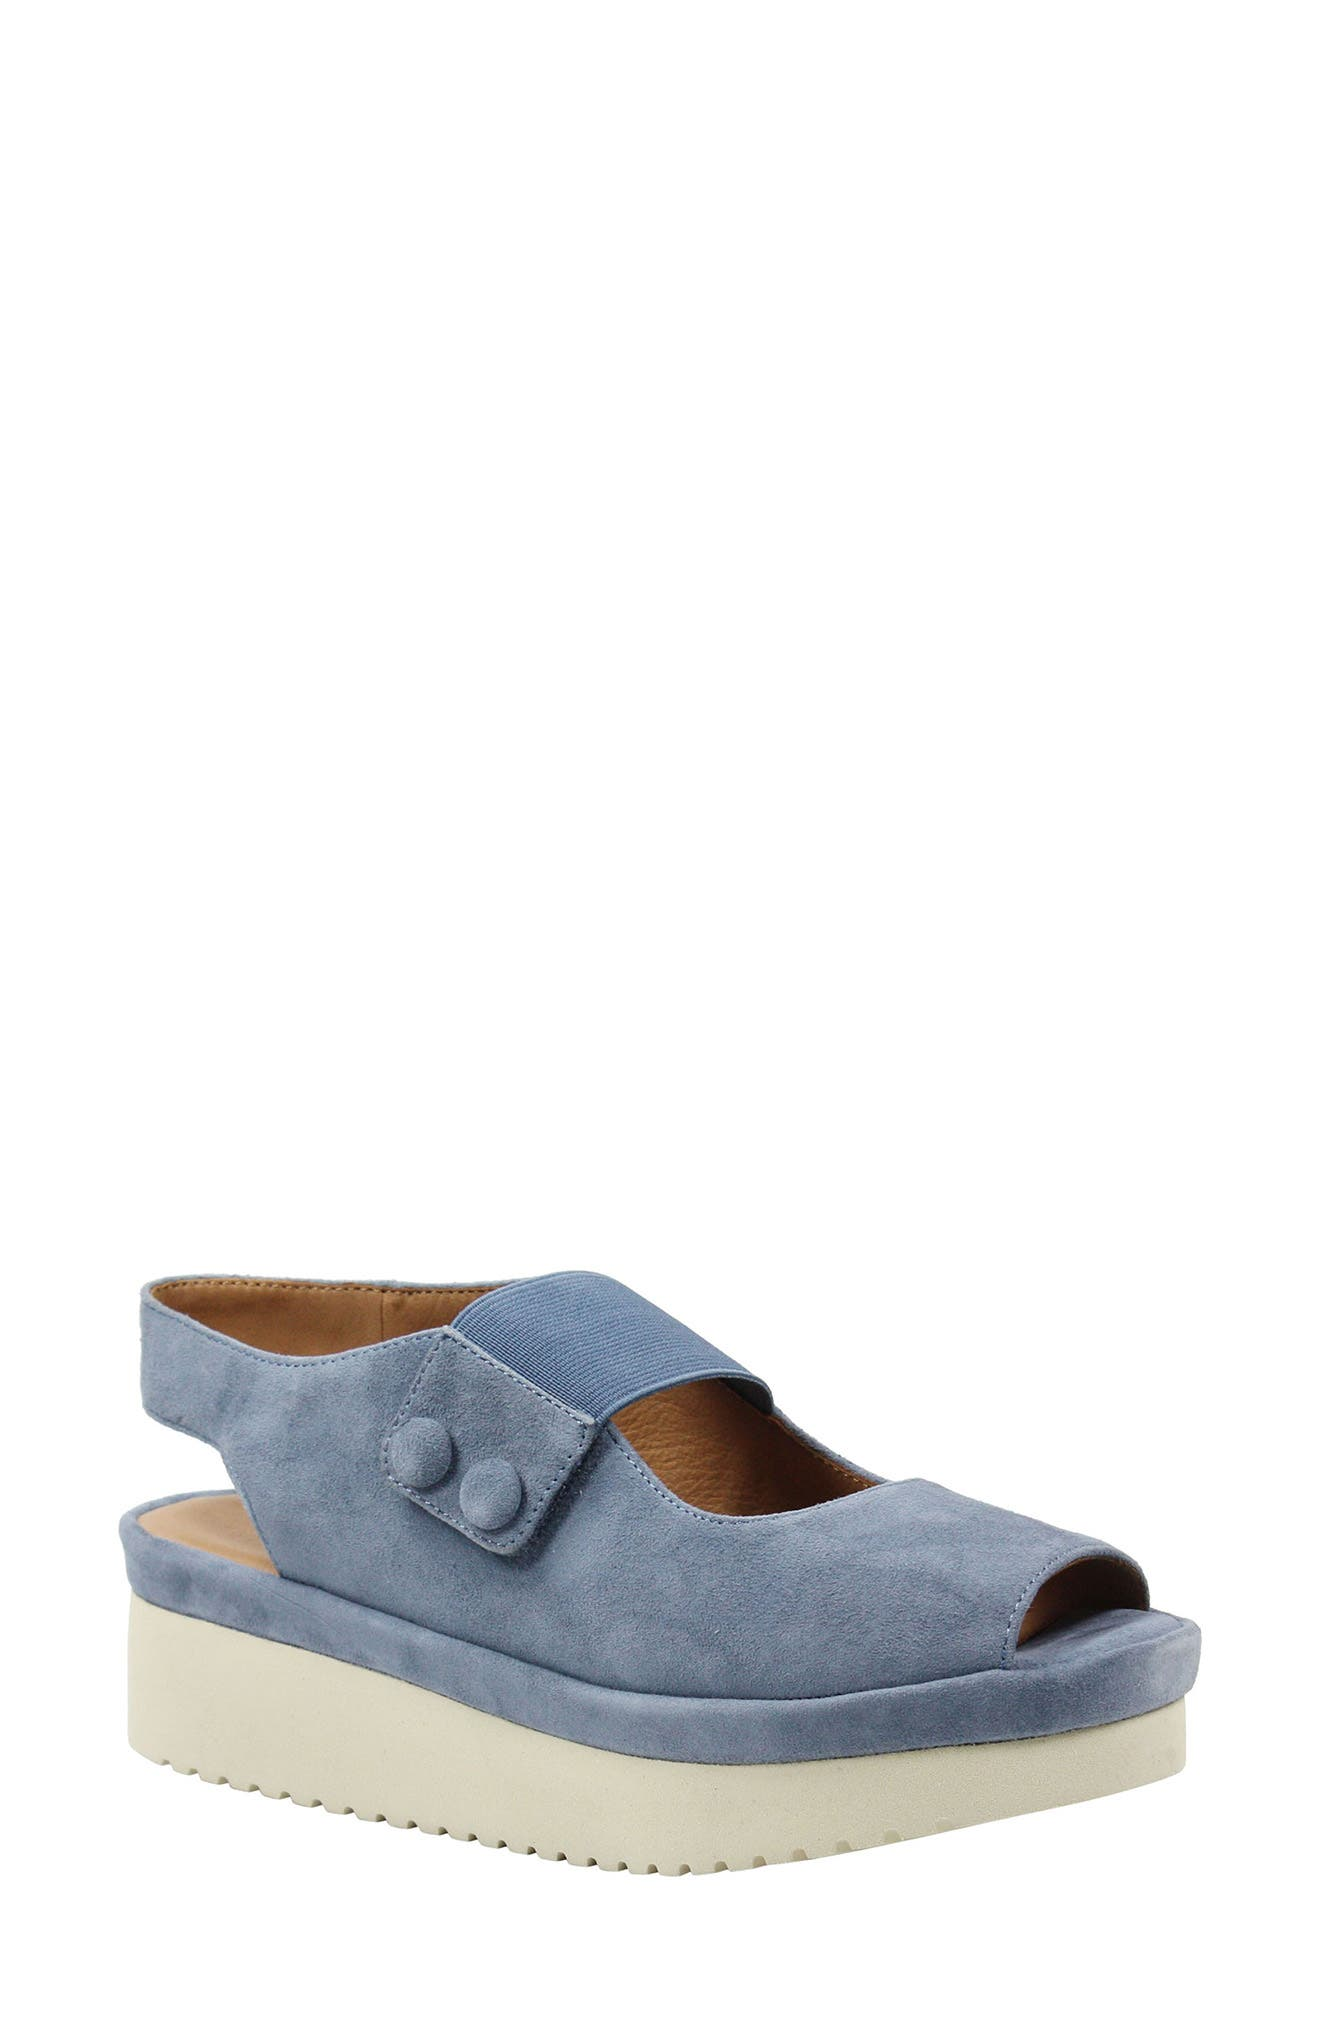 Adalicia Platform Sandal,                         Main,                         color, Ink Kid Suede